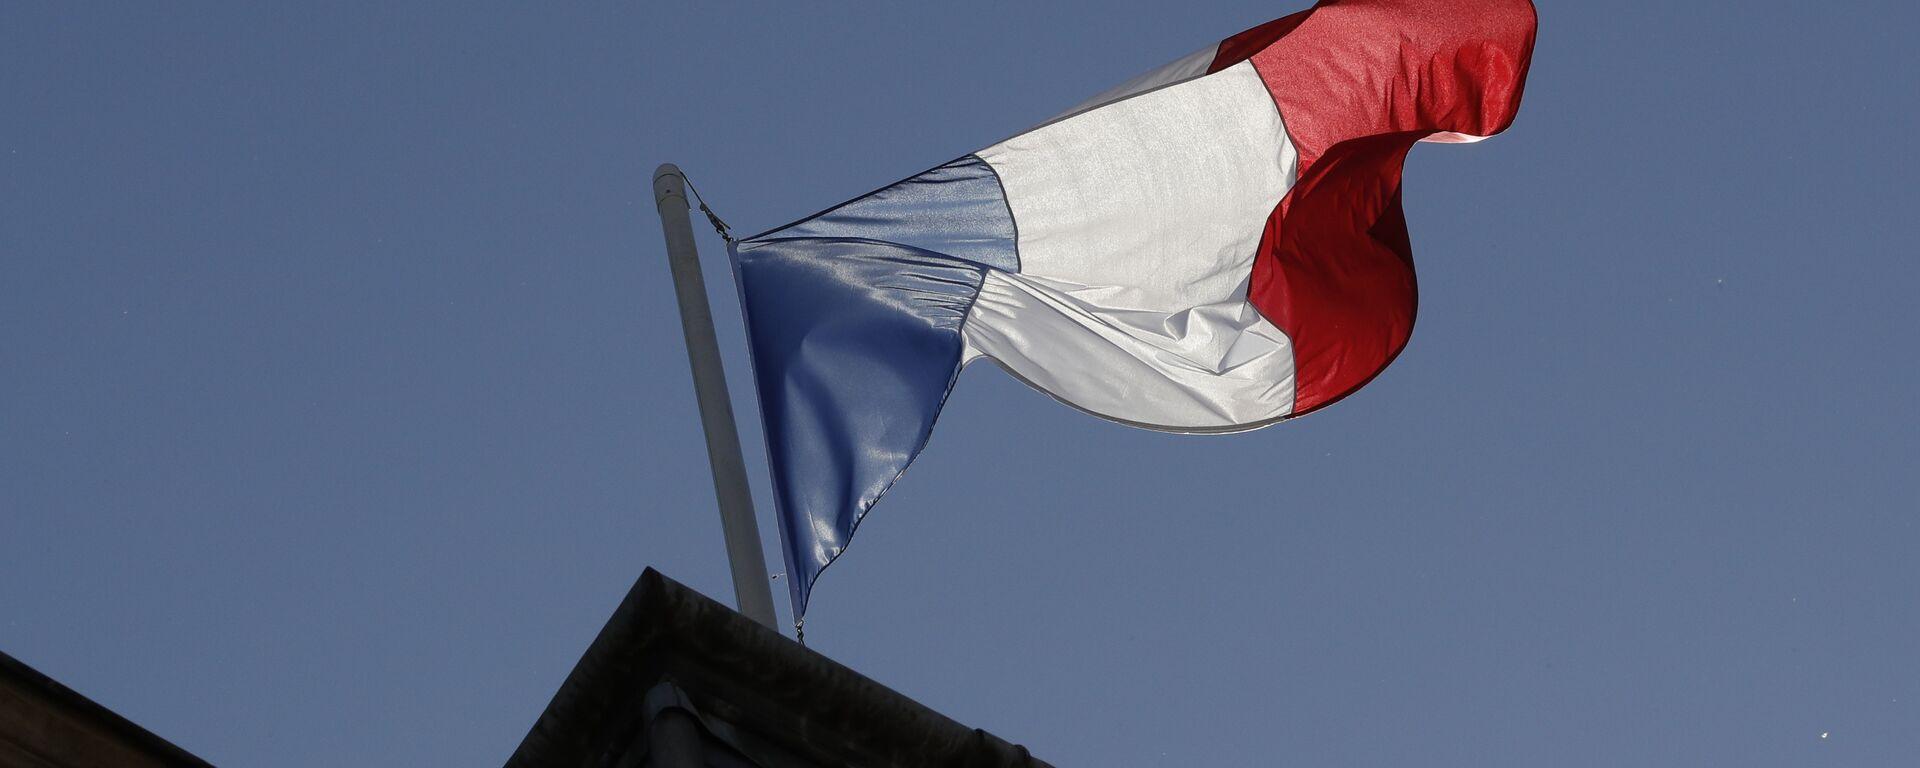 Bandera de Francia - Sputnik Mundo, 1920, 24.02.2021